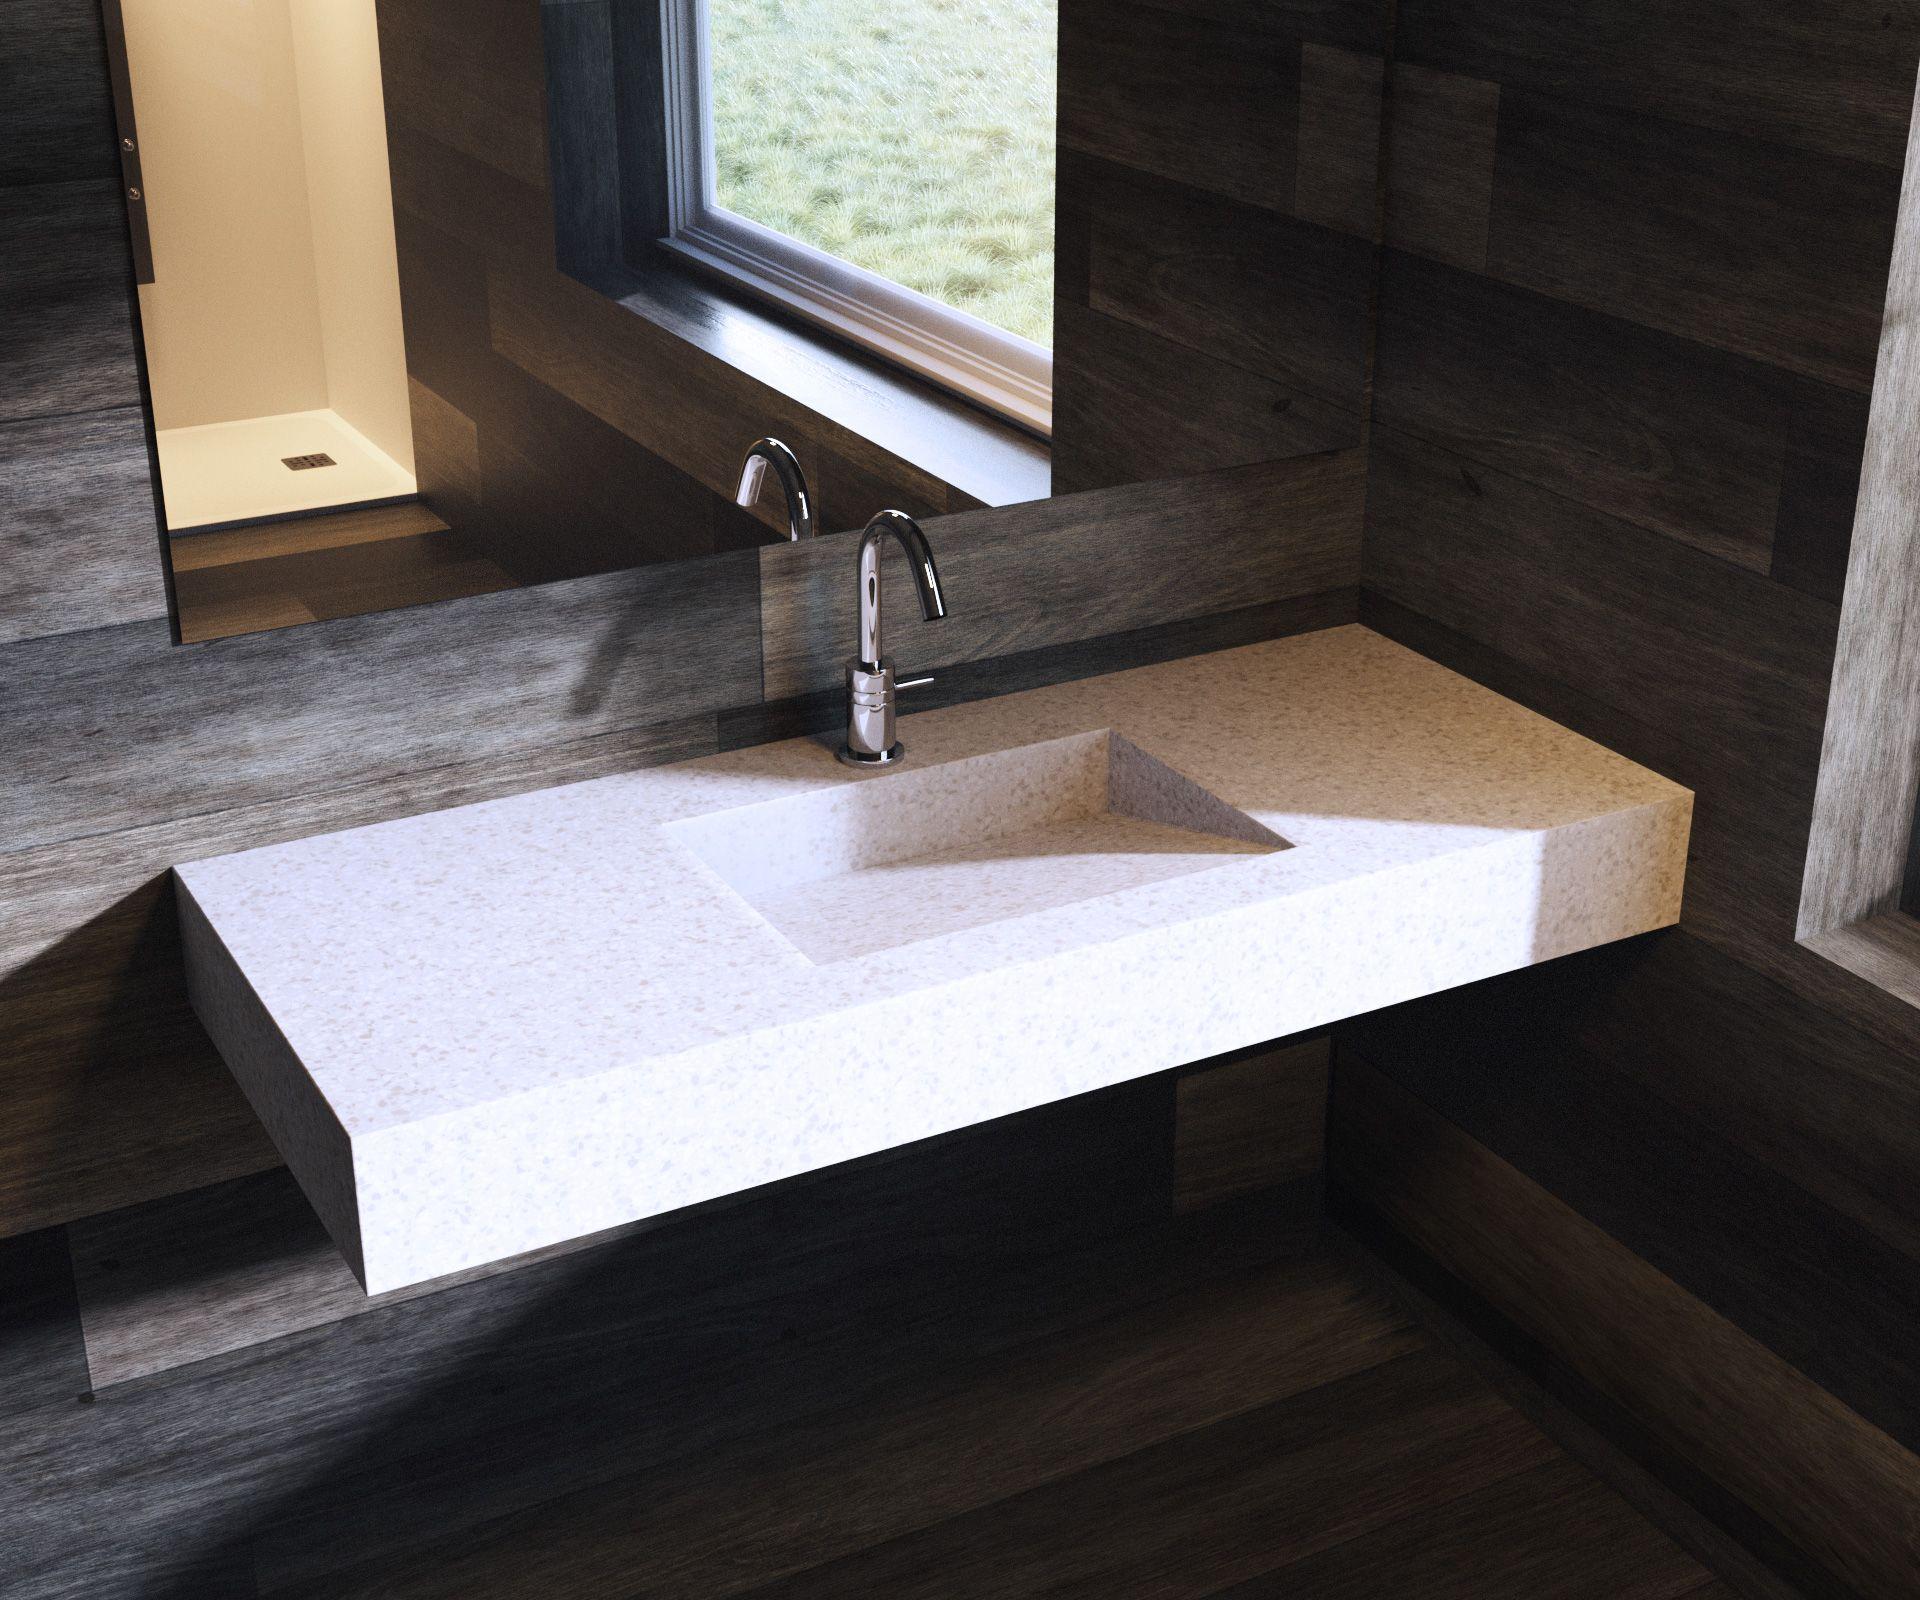 Plan Vasque En Quartz Terrazzo White Salle De Bain Tendance Plan De Travail Cuisine Terrazzo